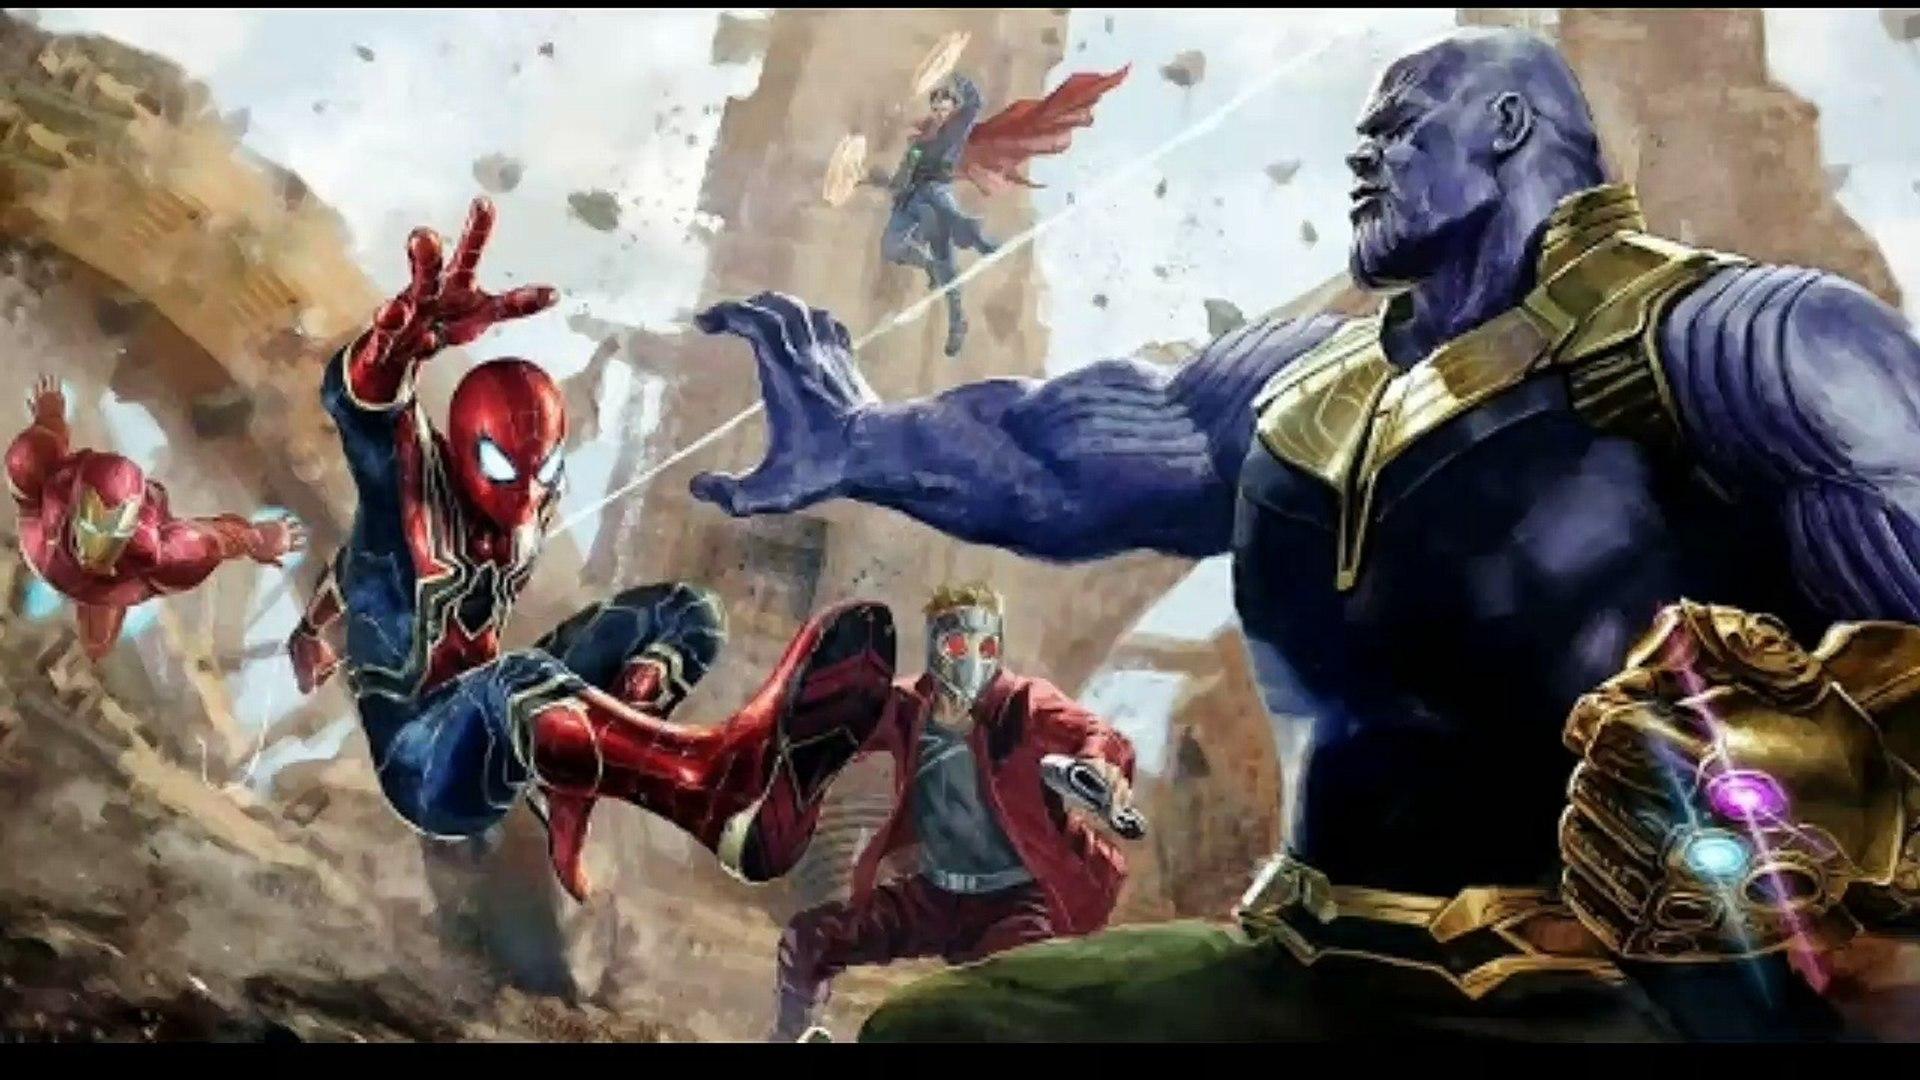 Avengers vs Thanos| Avengers infinity war Titan battle scene part 2| Hindi|